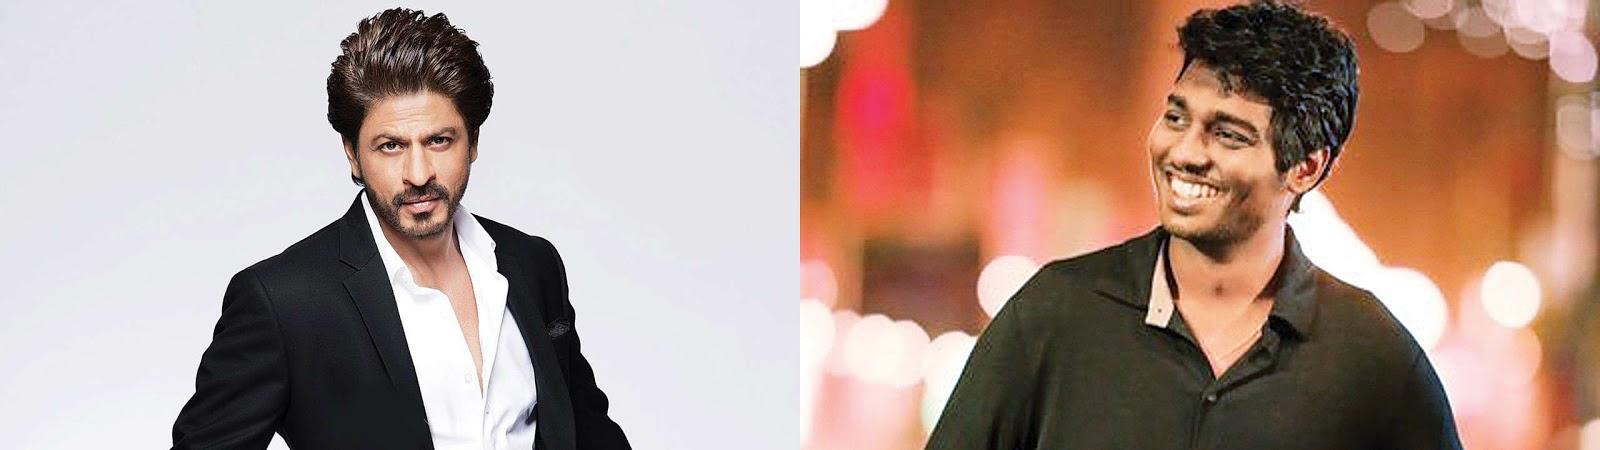 Bollywood Super Star Shah Rukh Khan in talks for 'Mersal' remake